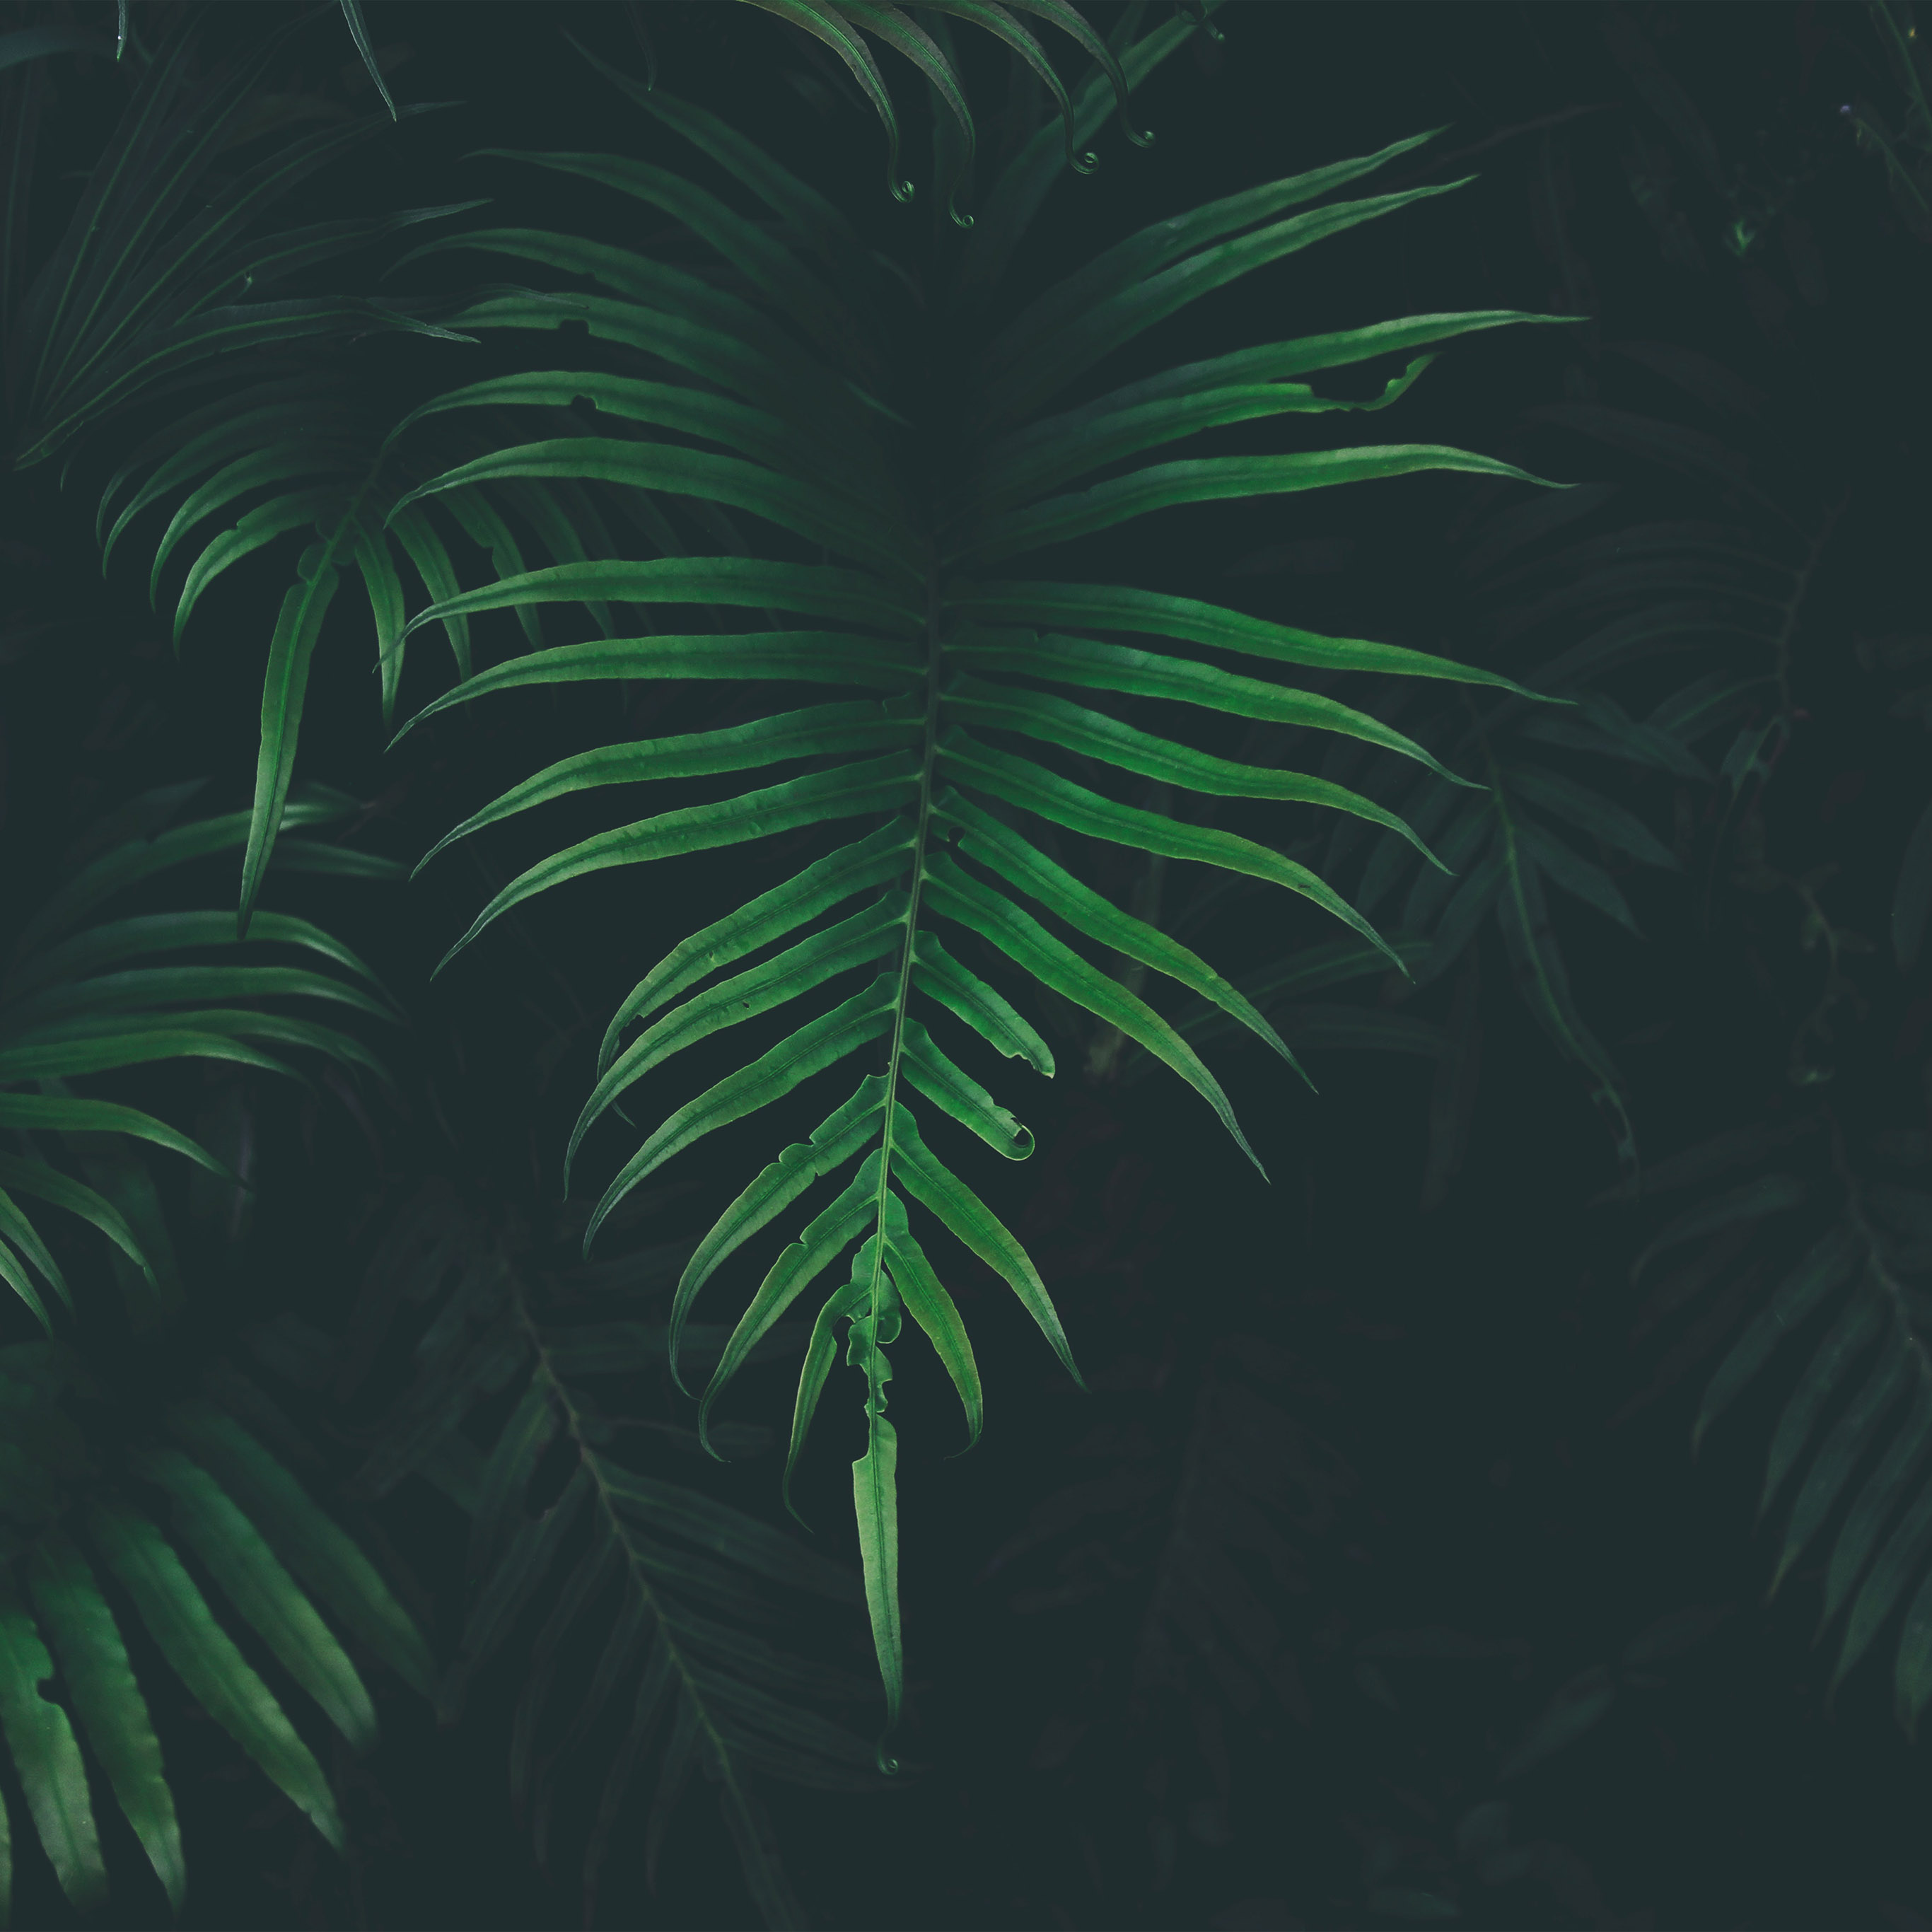 Nw44 Leaf Tree Dark Nature Wallpaper